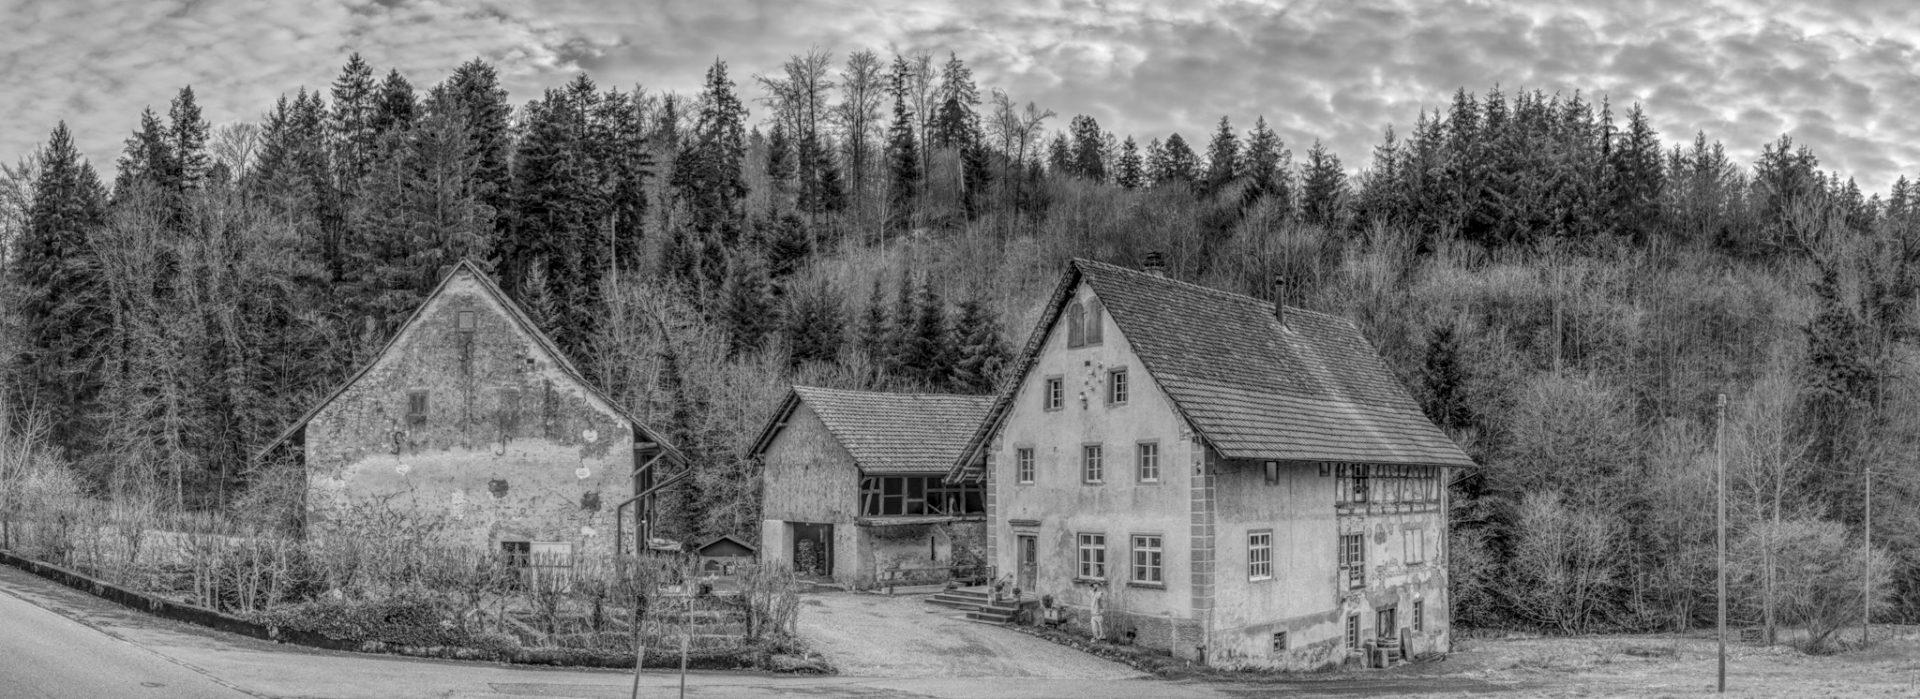 morsdorf.ch